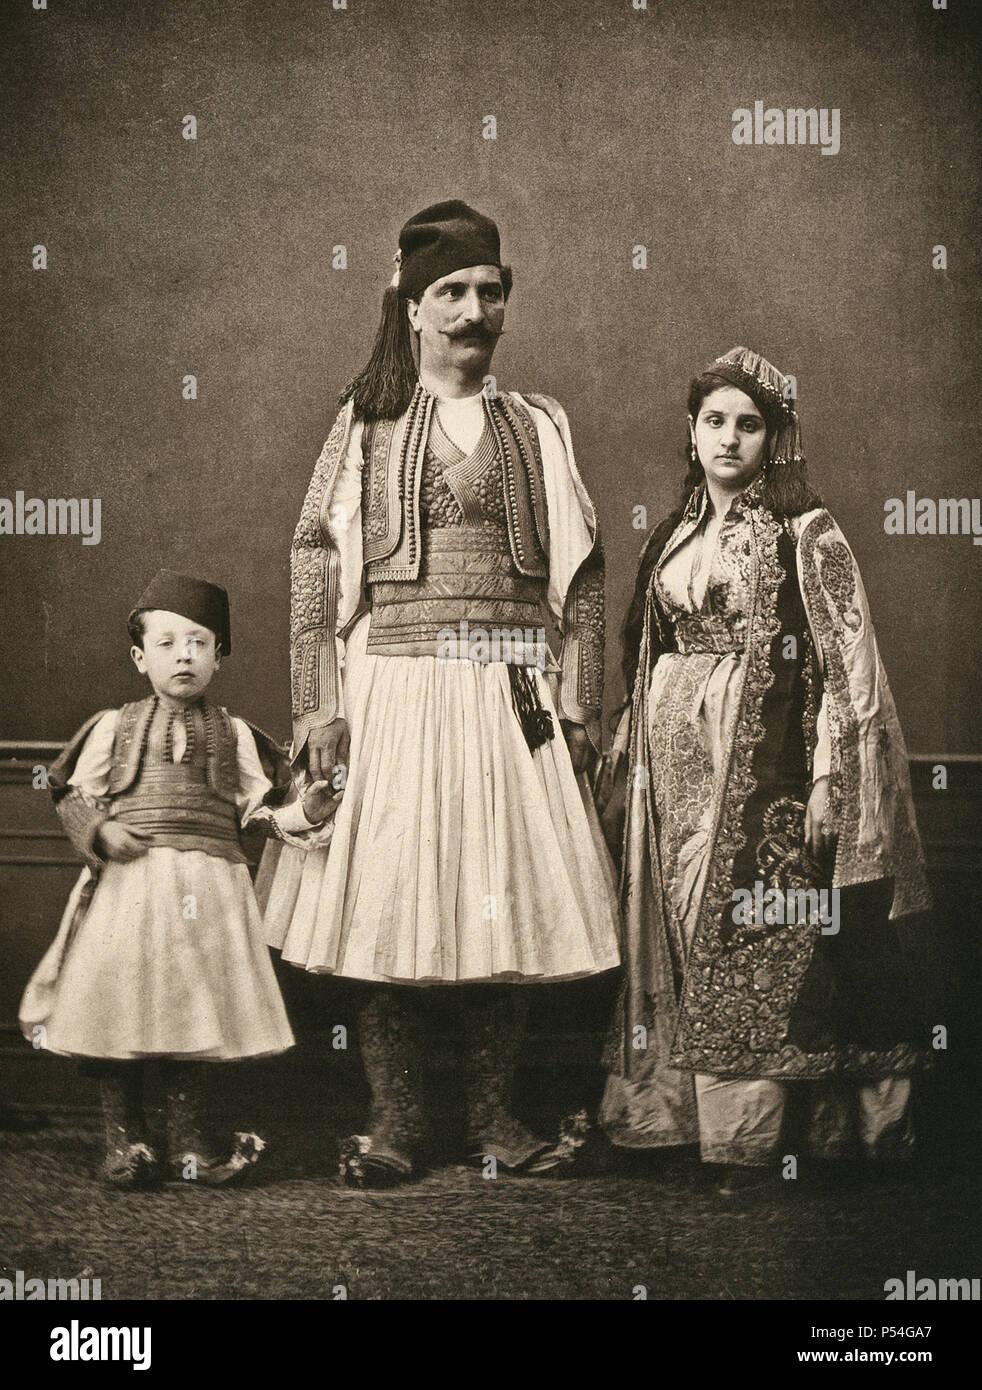 Studio portrait of models wearing traditional clothing from the province of Yanı̈a (Yanya), Ottoman Empire, circa 1873 - Stock Image